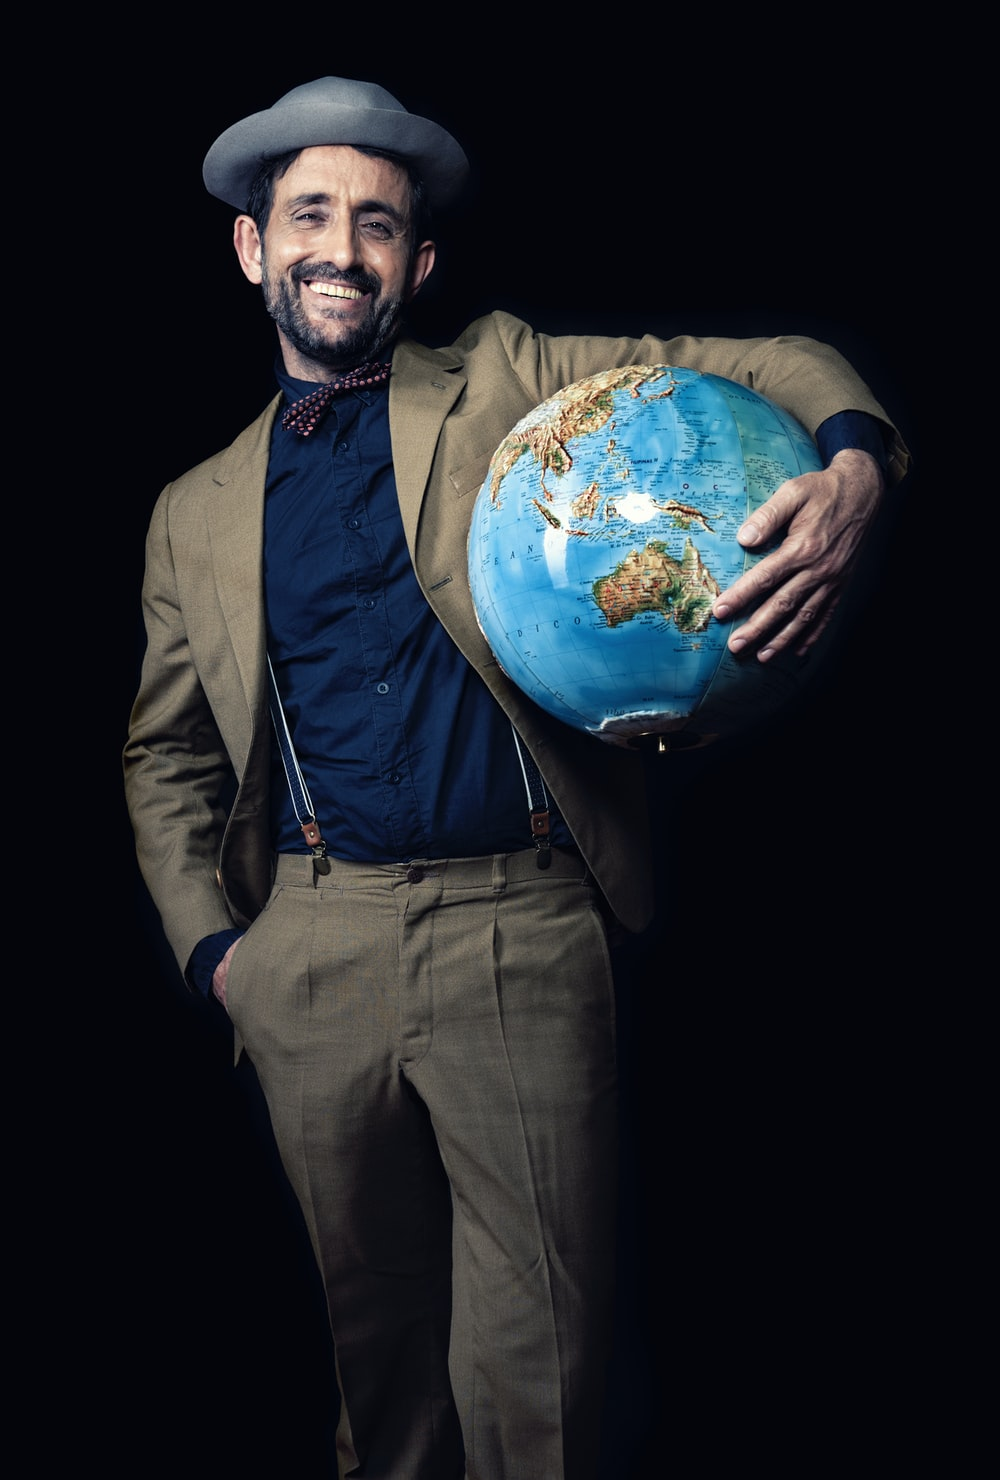 smiling man carrying blue globe